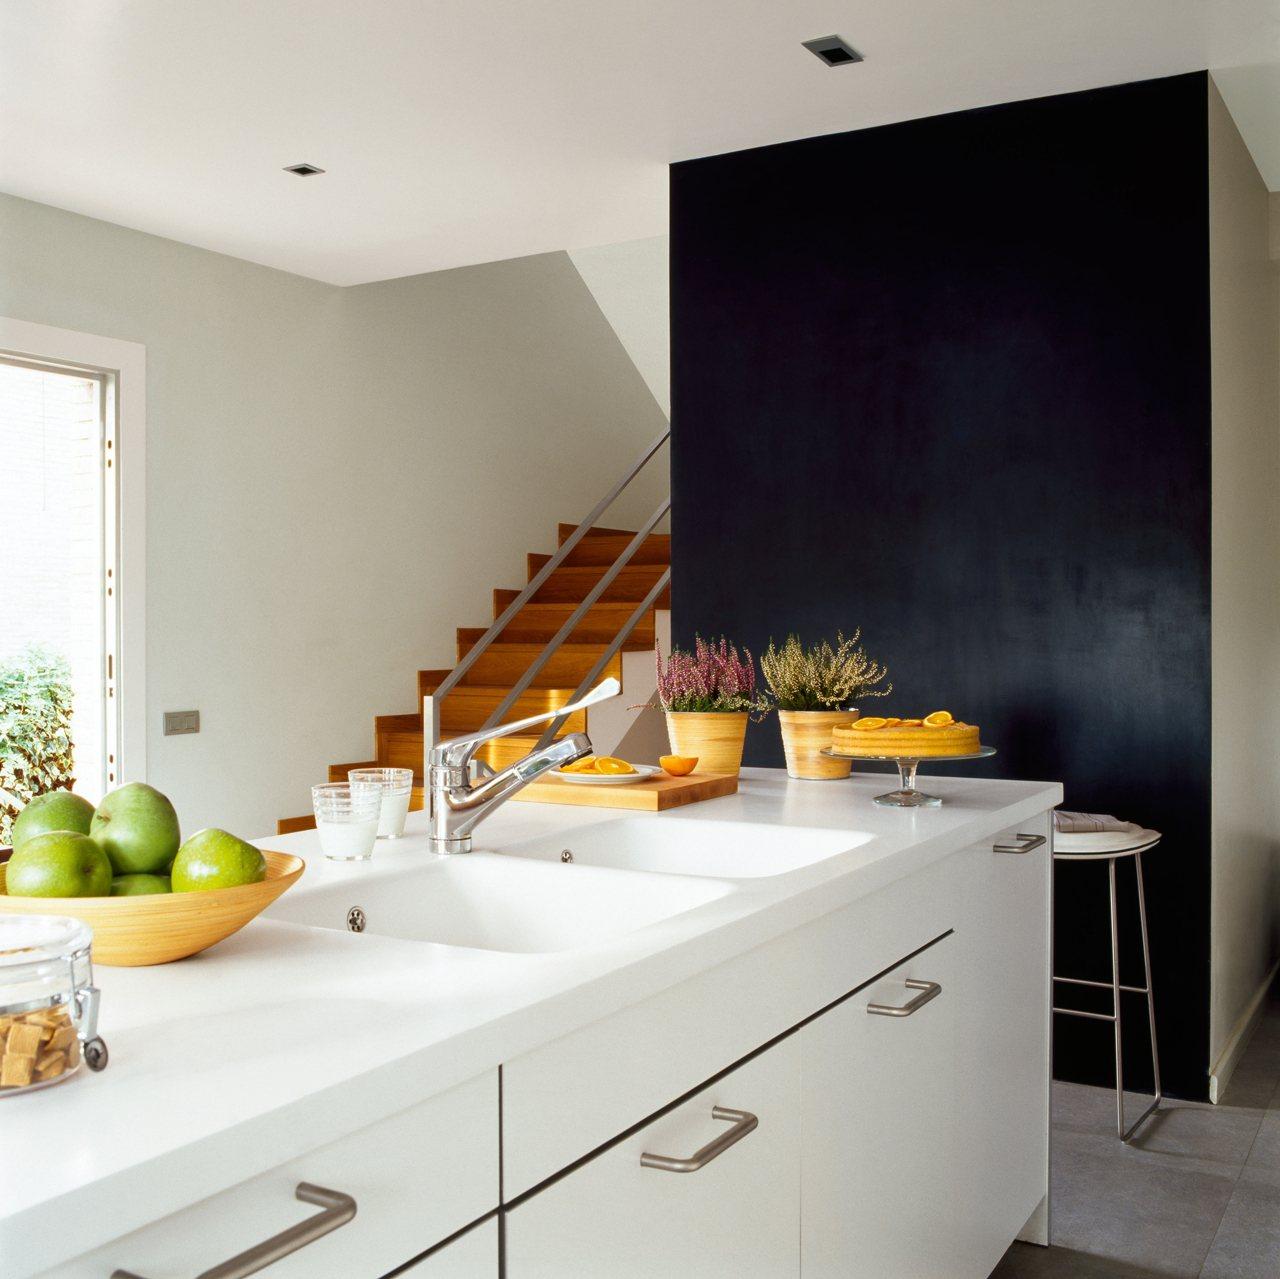 Buenas ideas para cocinas peque as for Cocinas pequenas y comodas